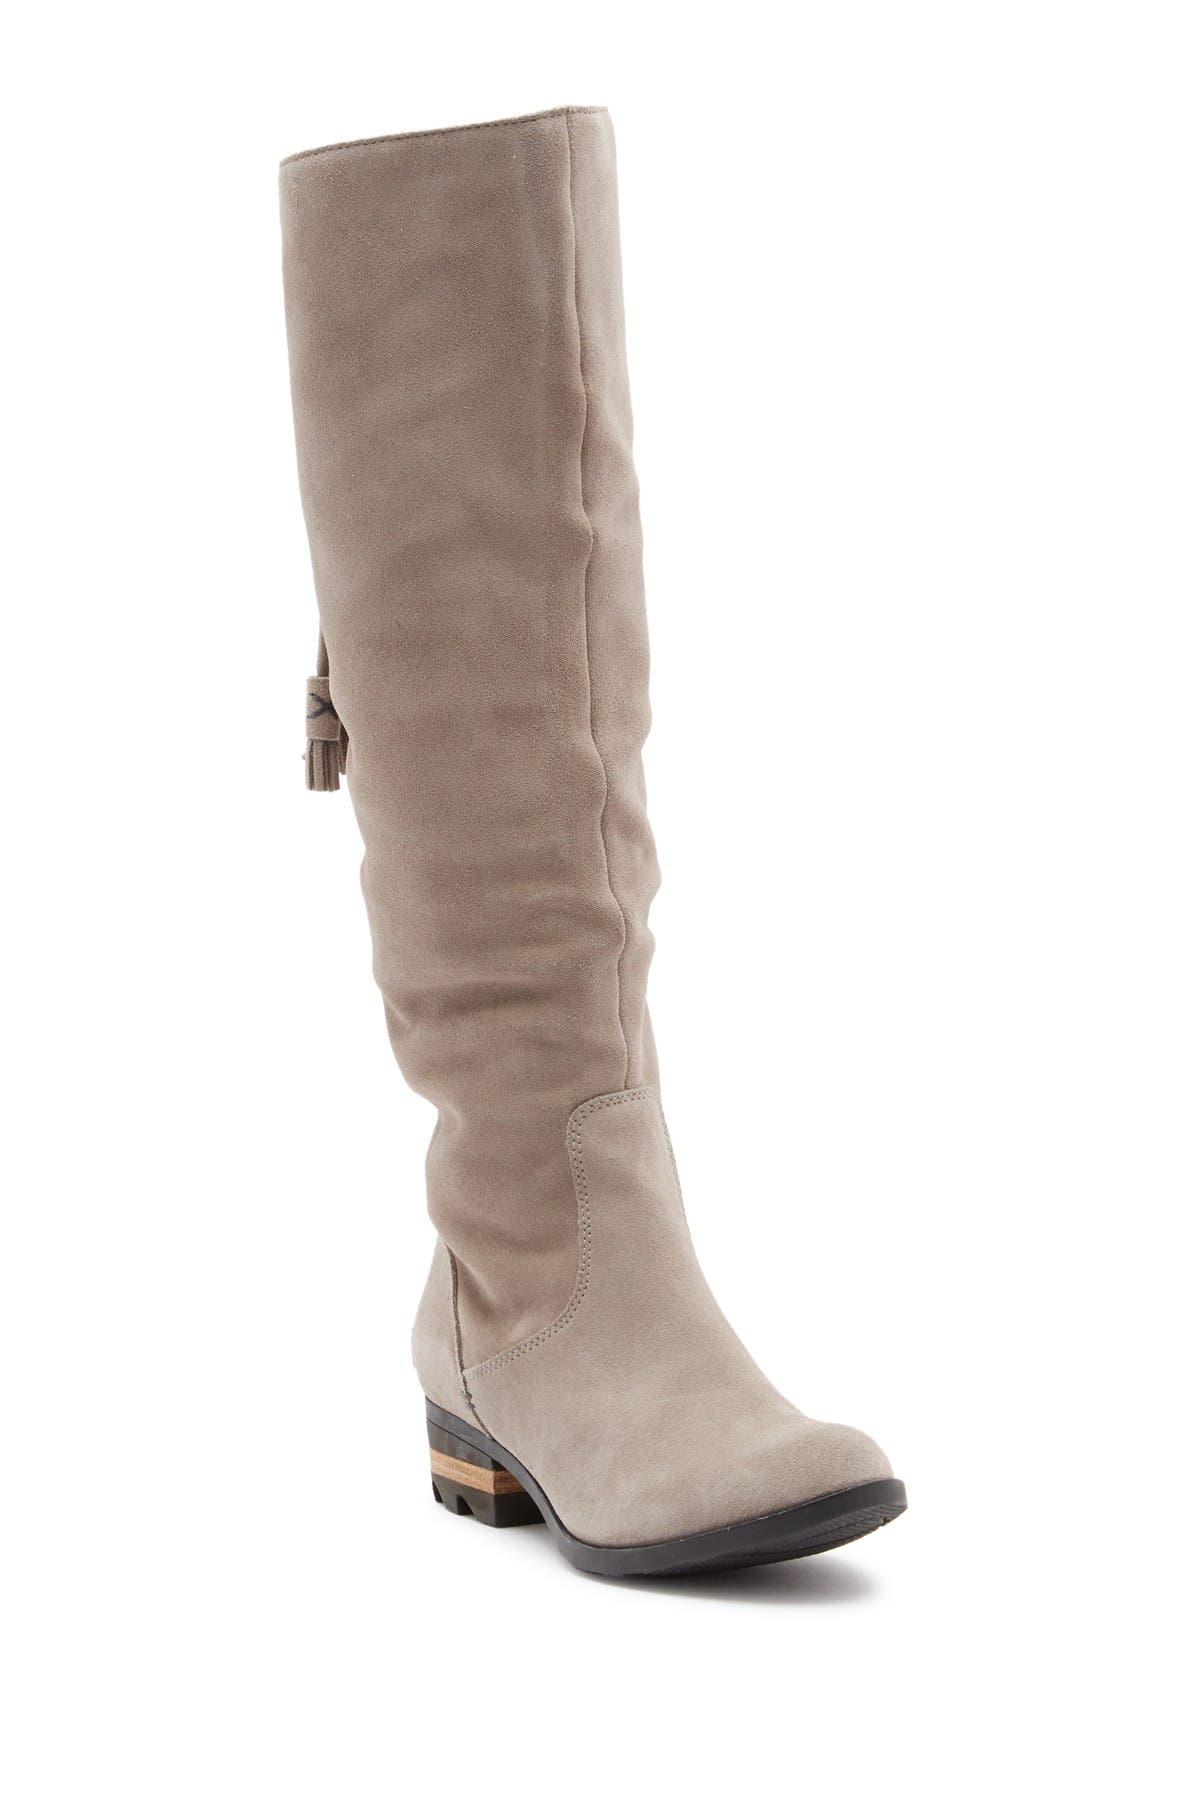 Sorel | Farah Tall Waterproof Suede